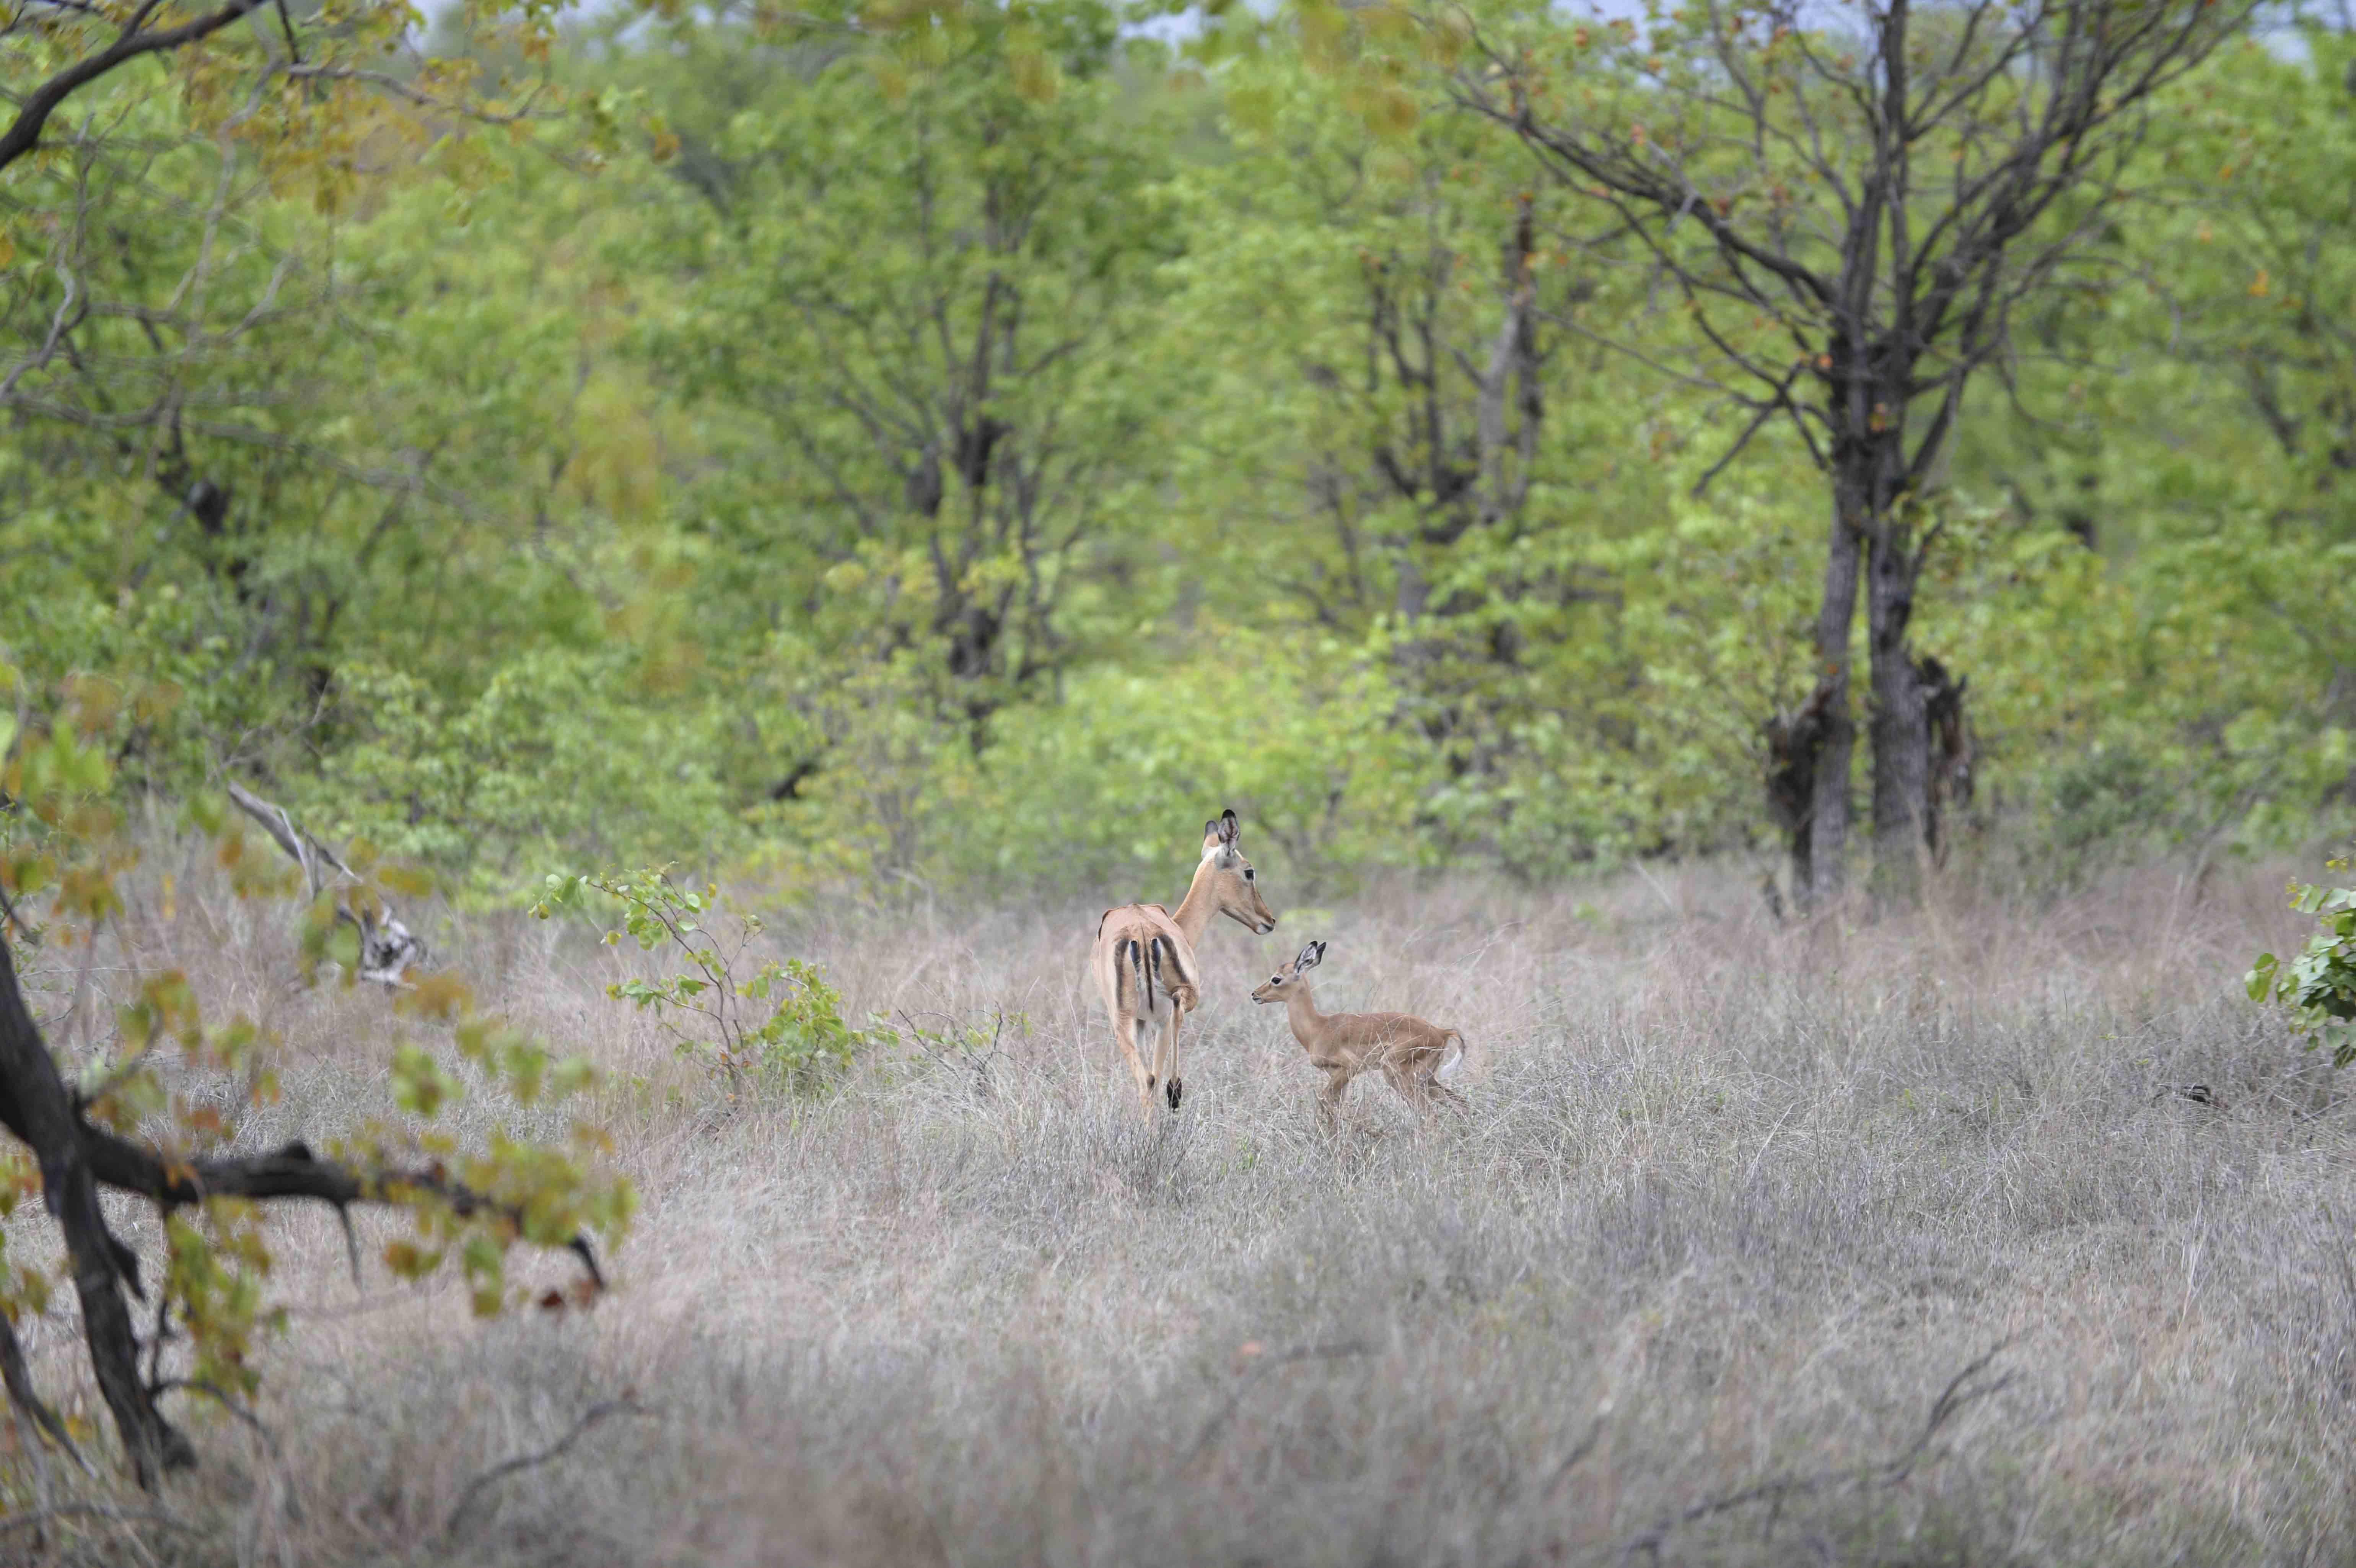 Impala Family (Aepyceros melampus), BW ©Johannes Ratermann